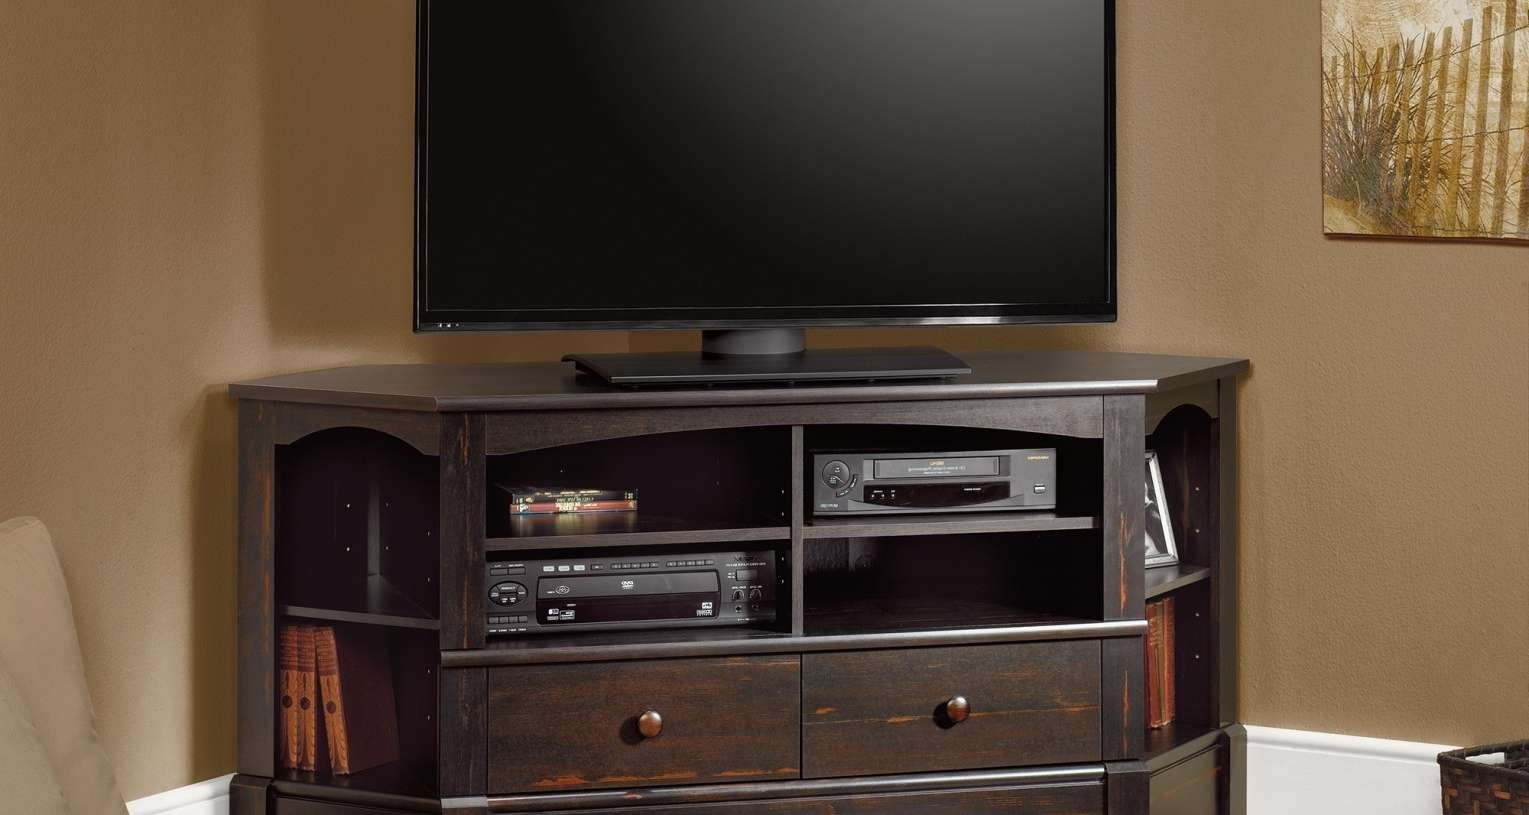 Cabinet : Black Mahogany Wood Corner Tv Stand With Storage Shelves Regarding Mahogany Corner Tv Stands (View 3 of 15)